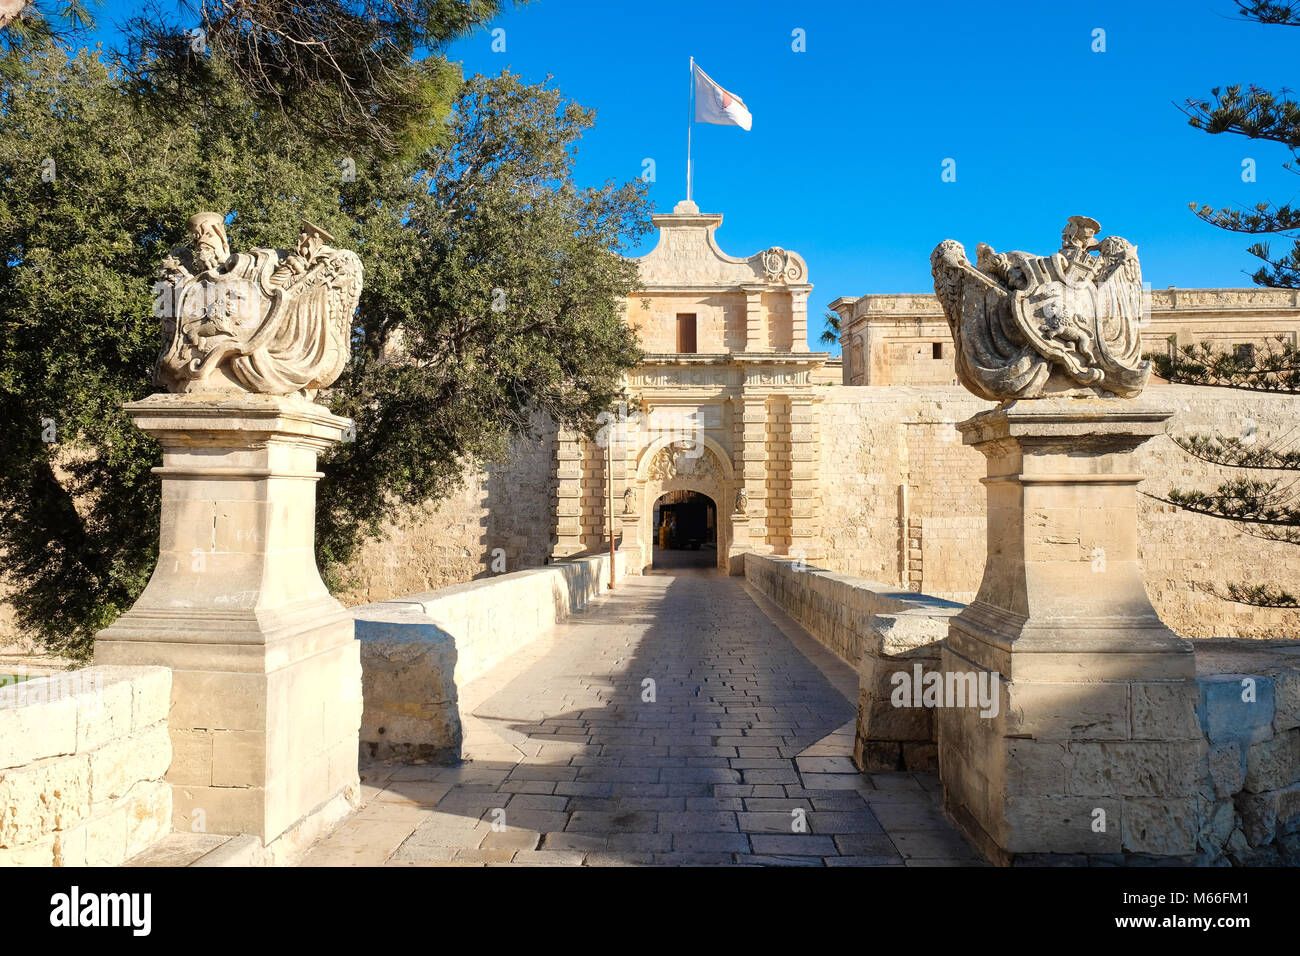 Mdina city gate. Old fortress. Malta - Stock Image